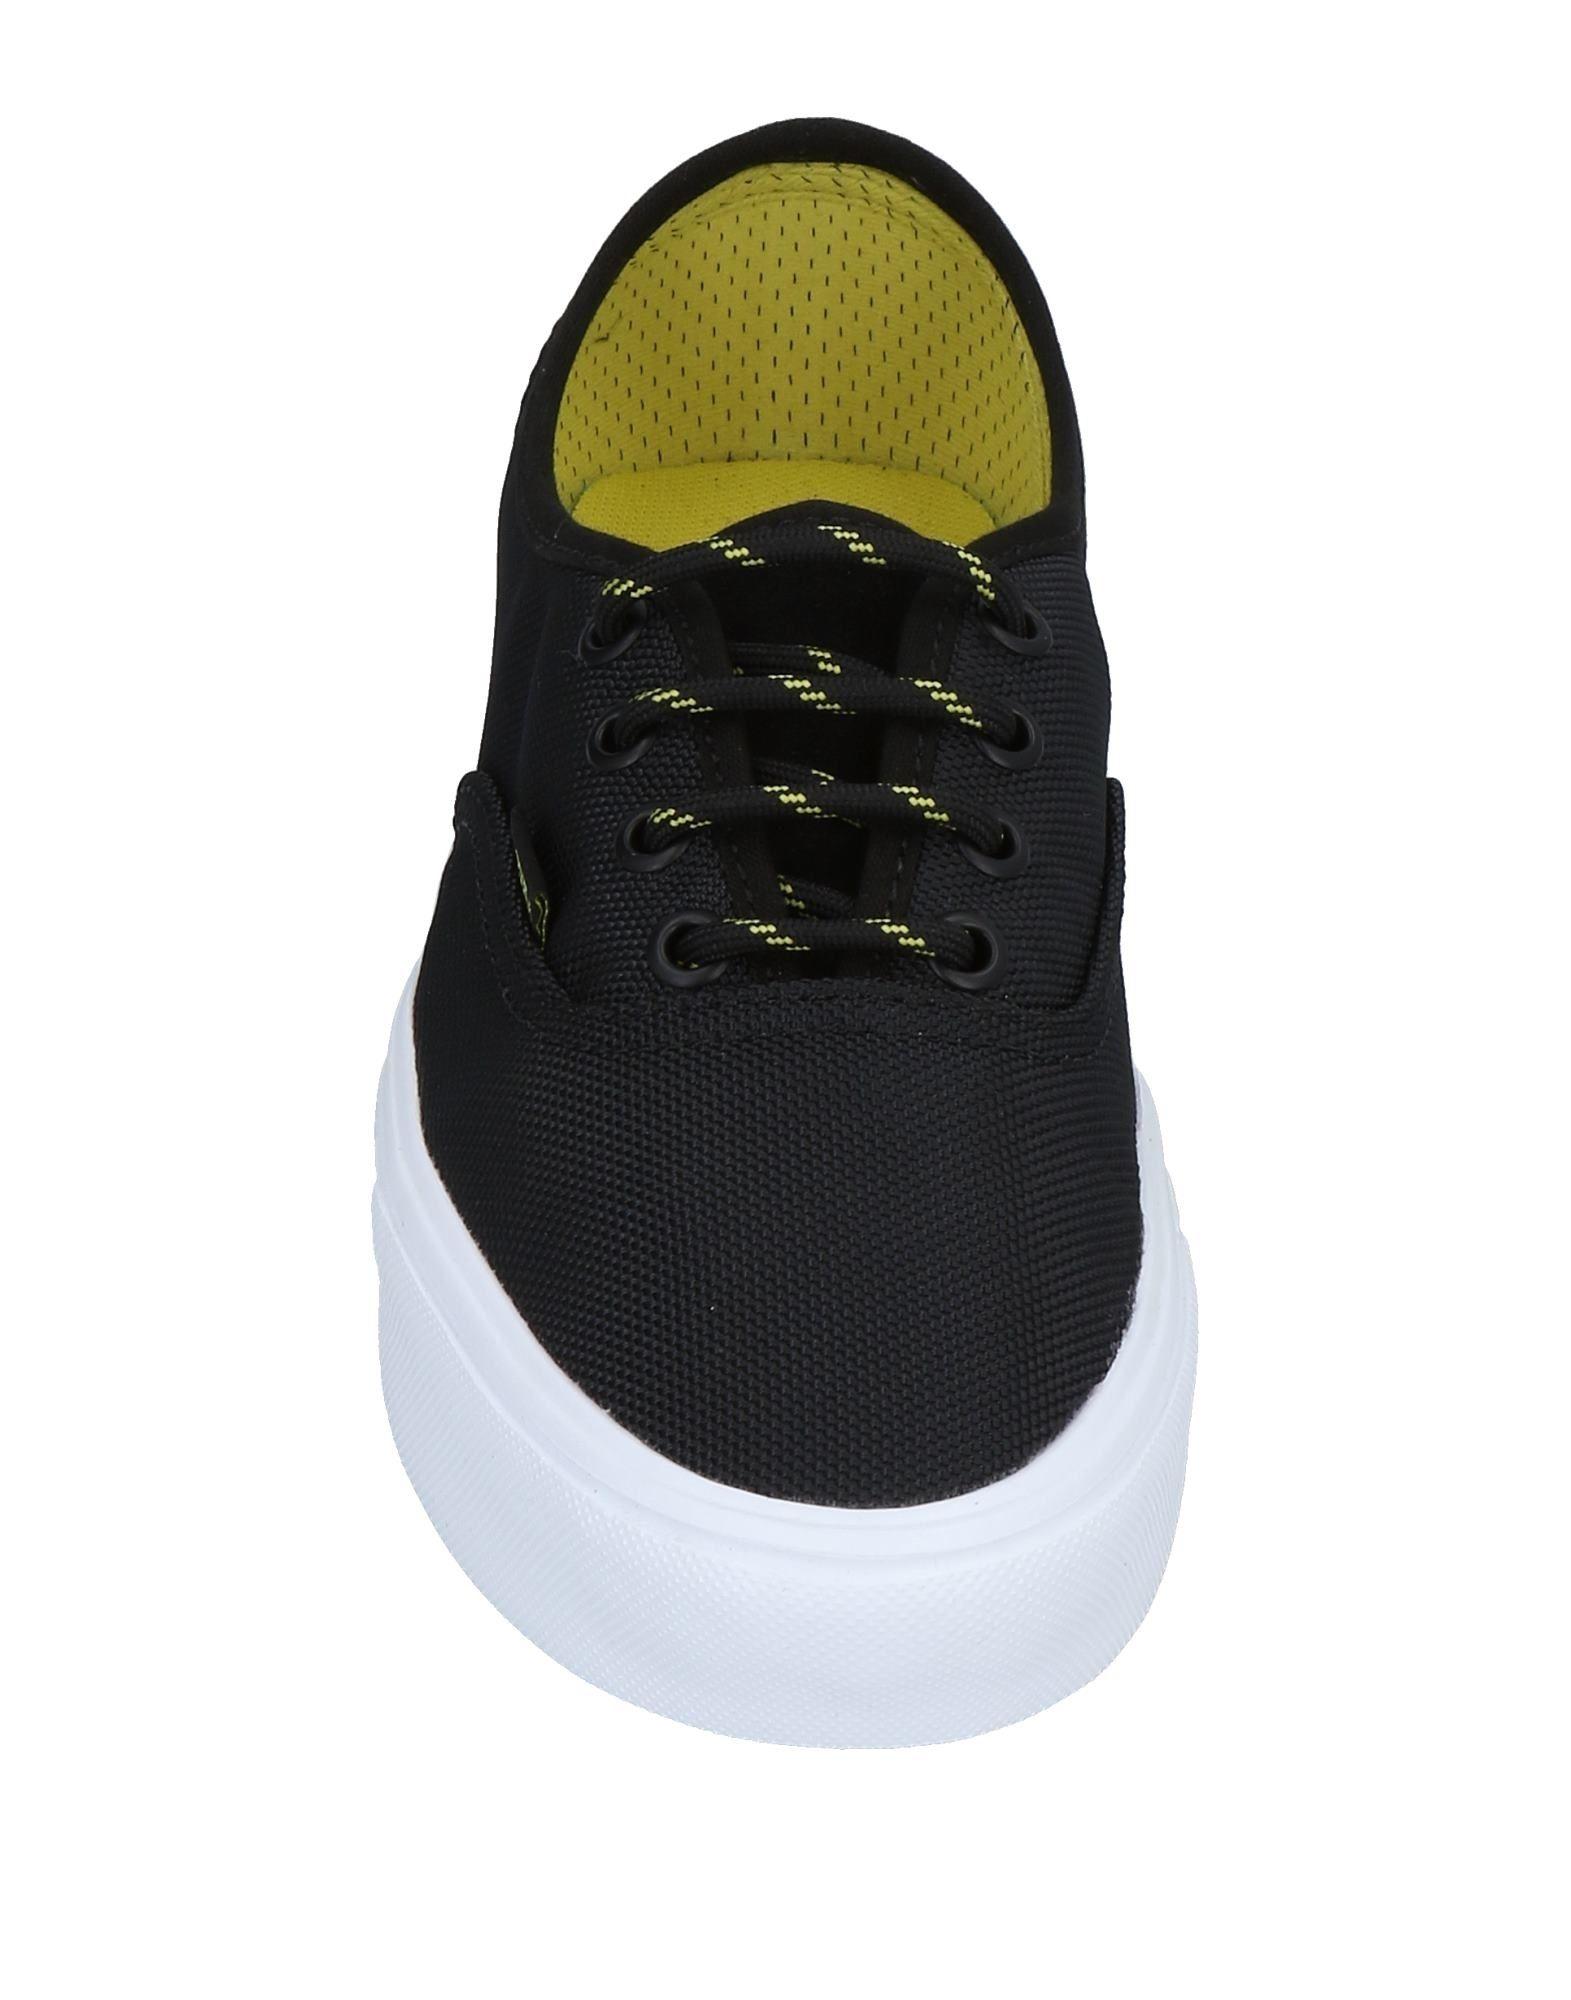 Vans 11478042MB Sneakers Damen  11478042MB Vans Gute Qualität beliebte Schuhe 55d7b9